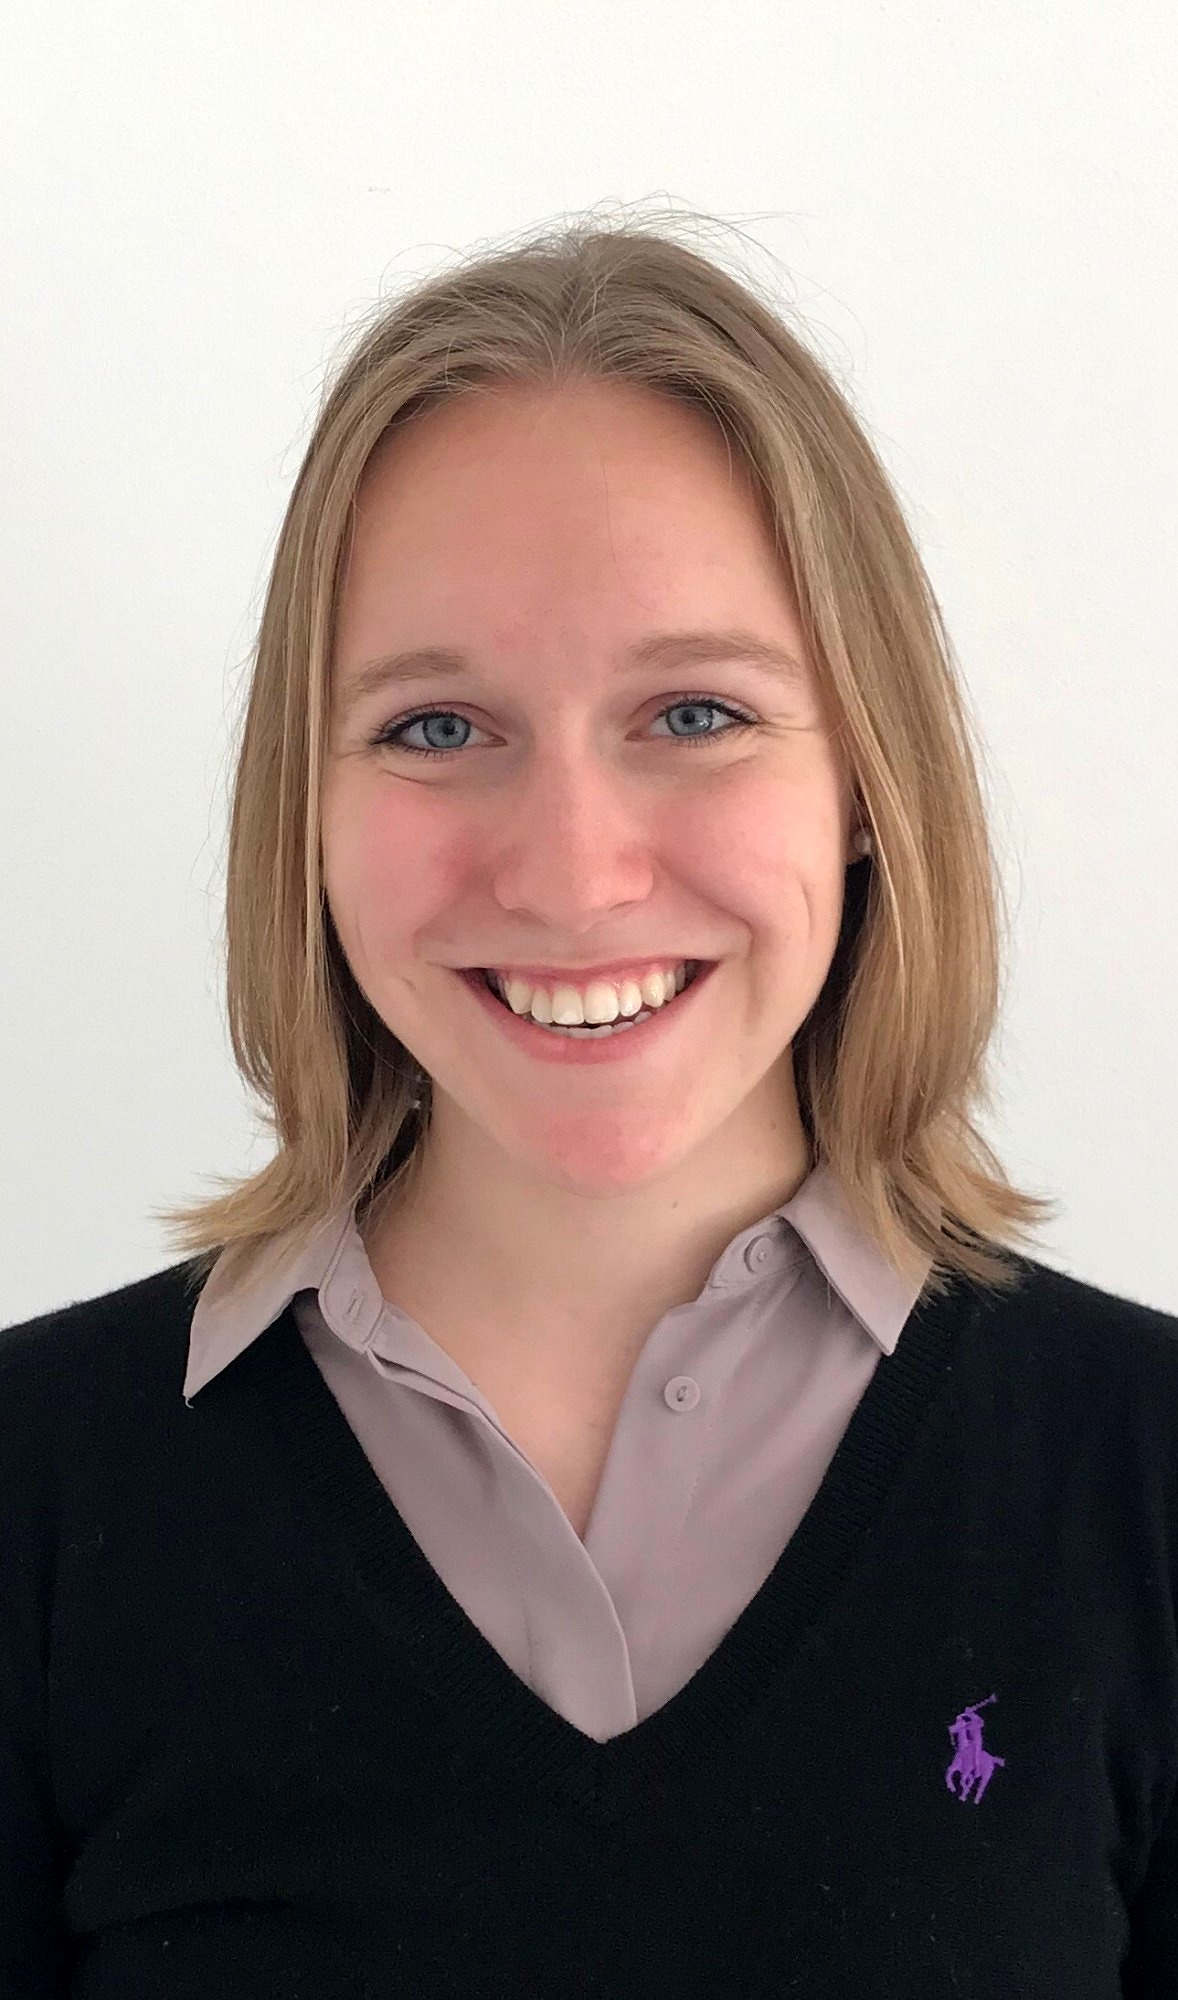 Sophia Wittenborn